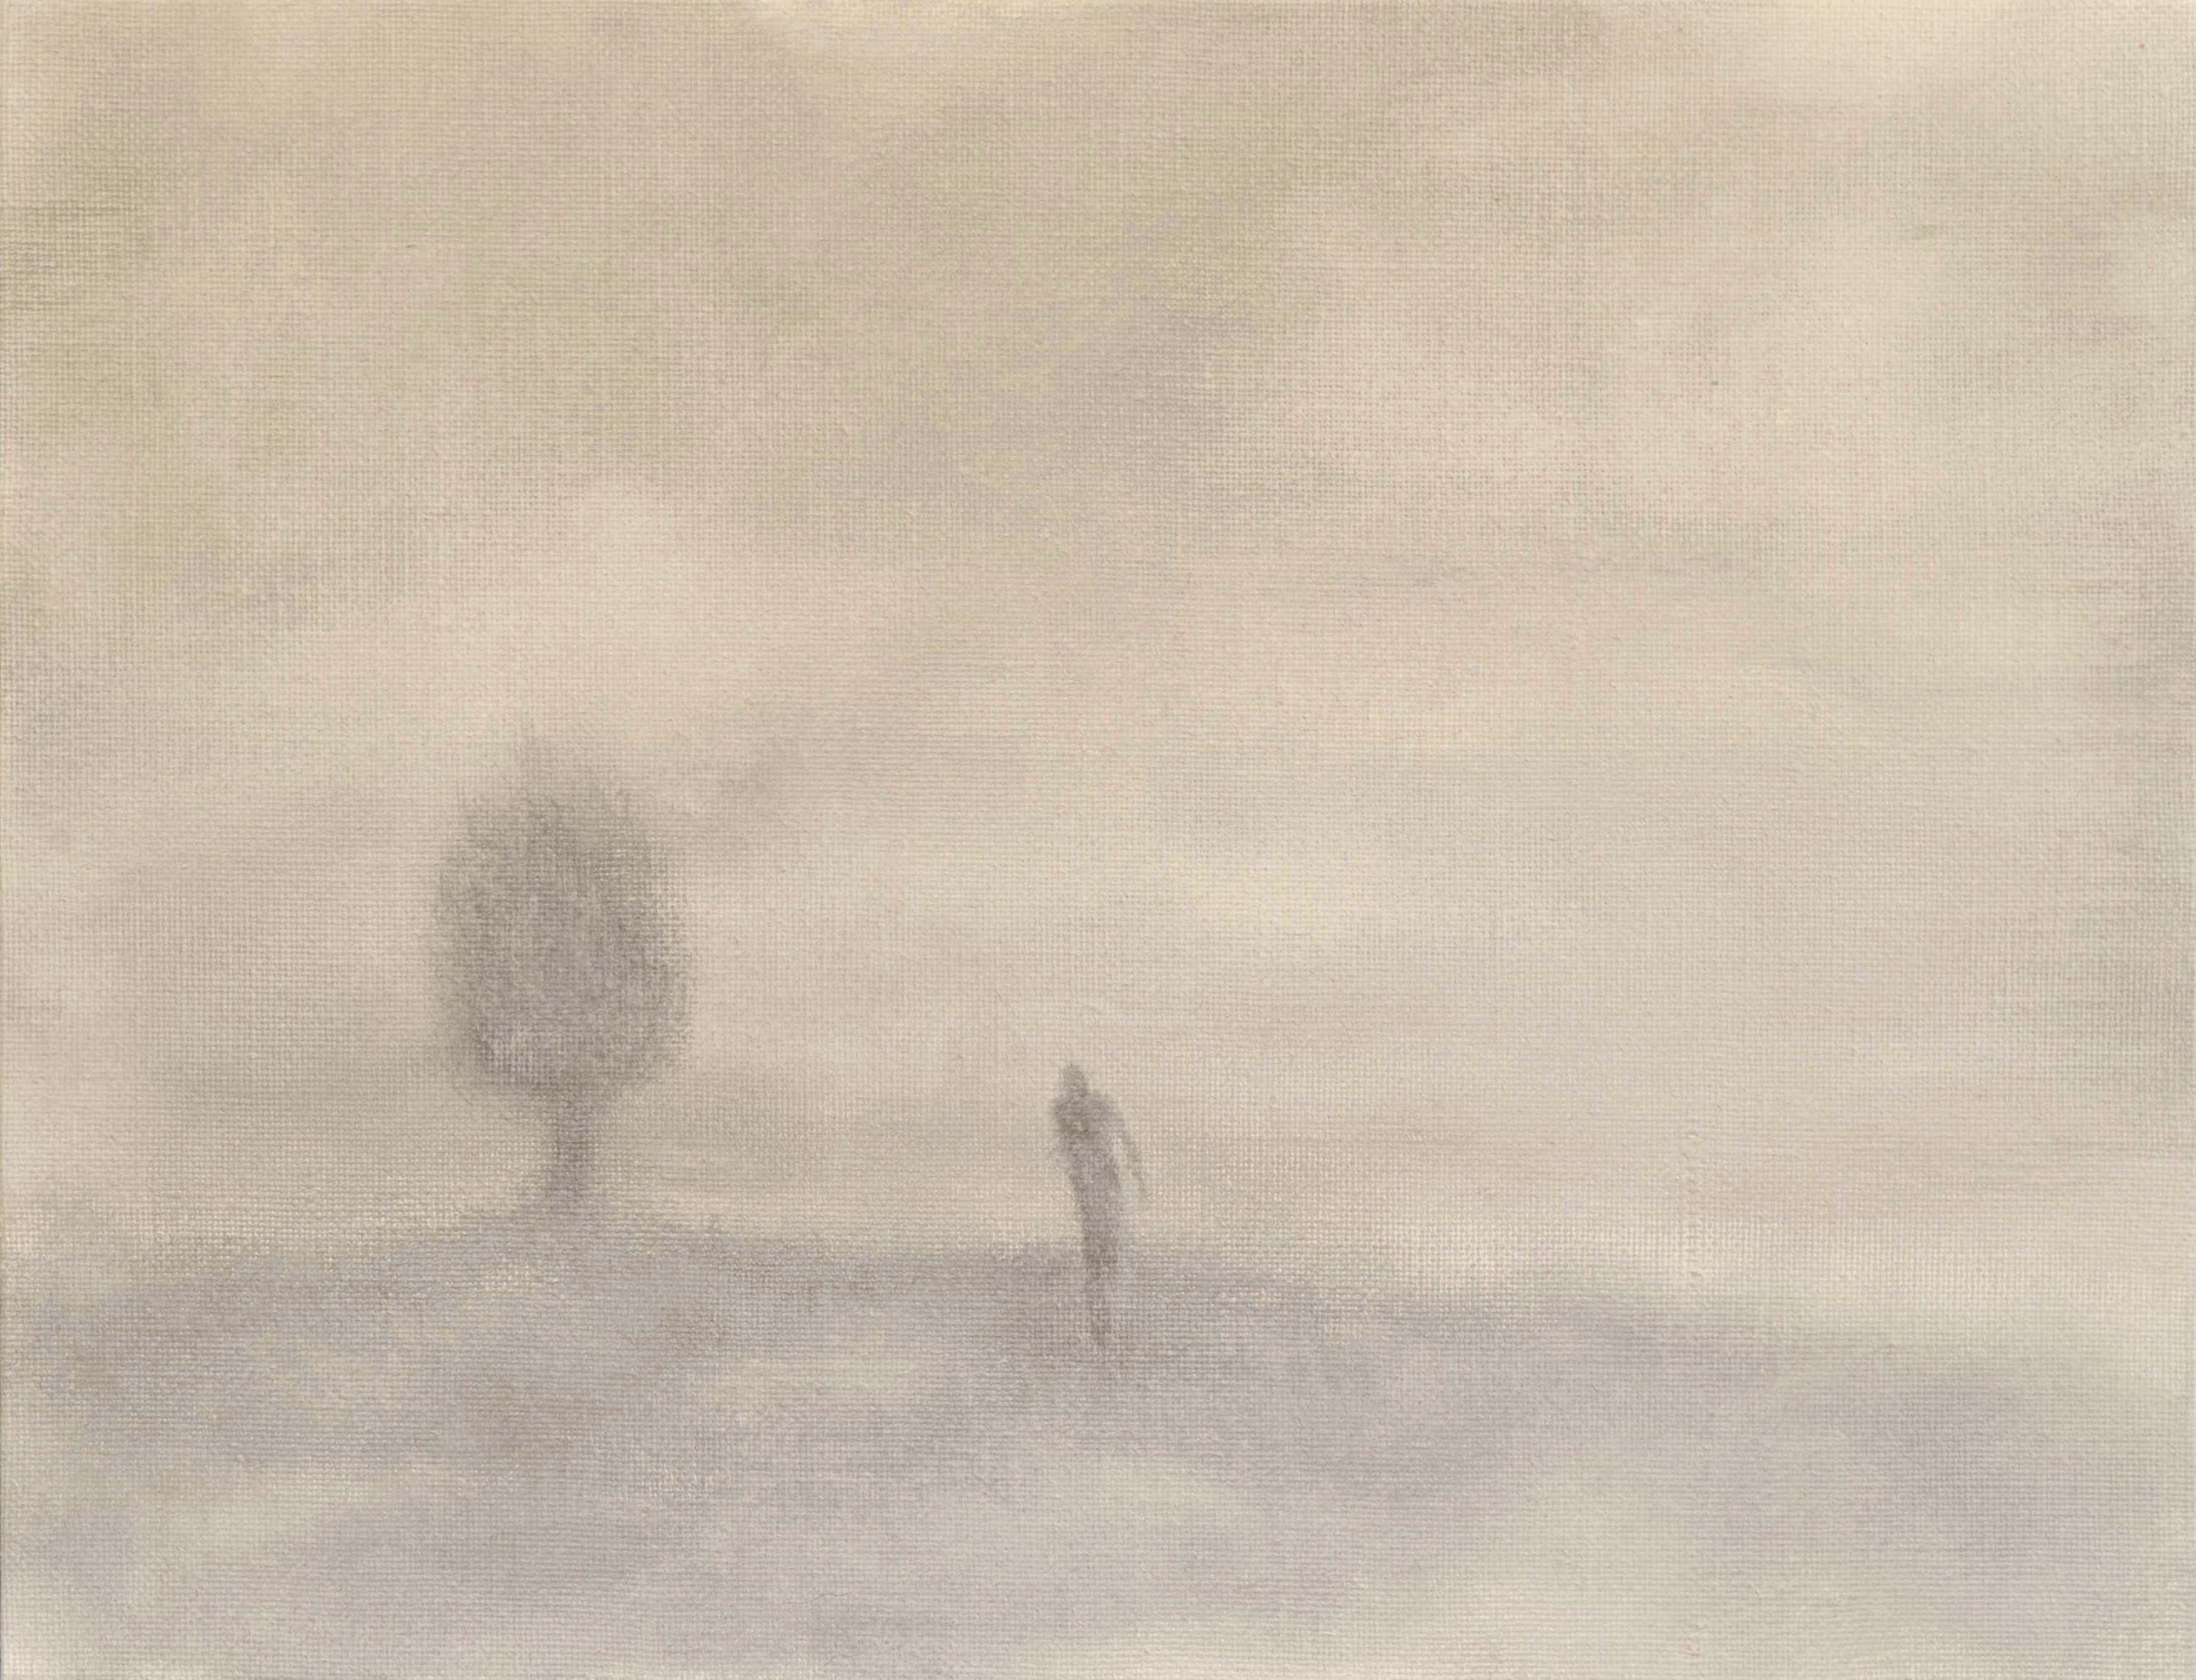 Mystic Landscapes 025